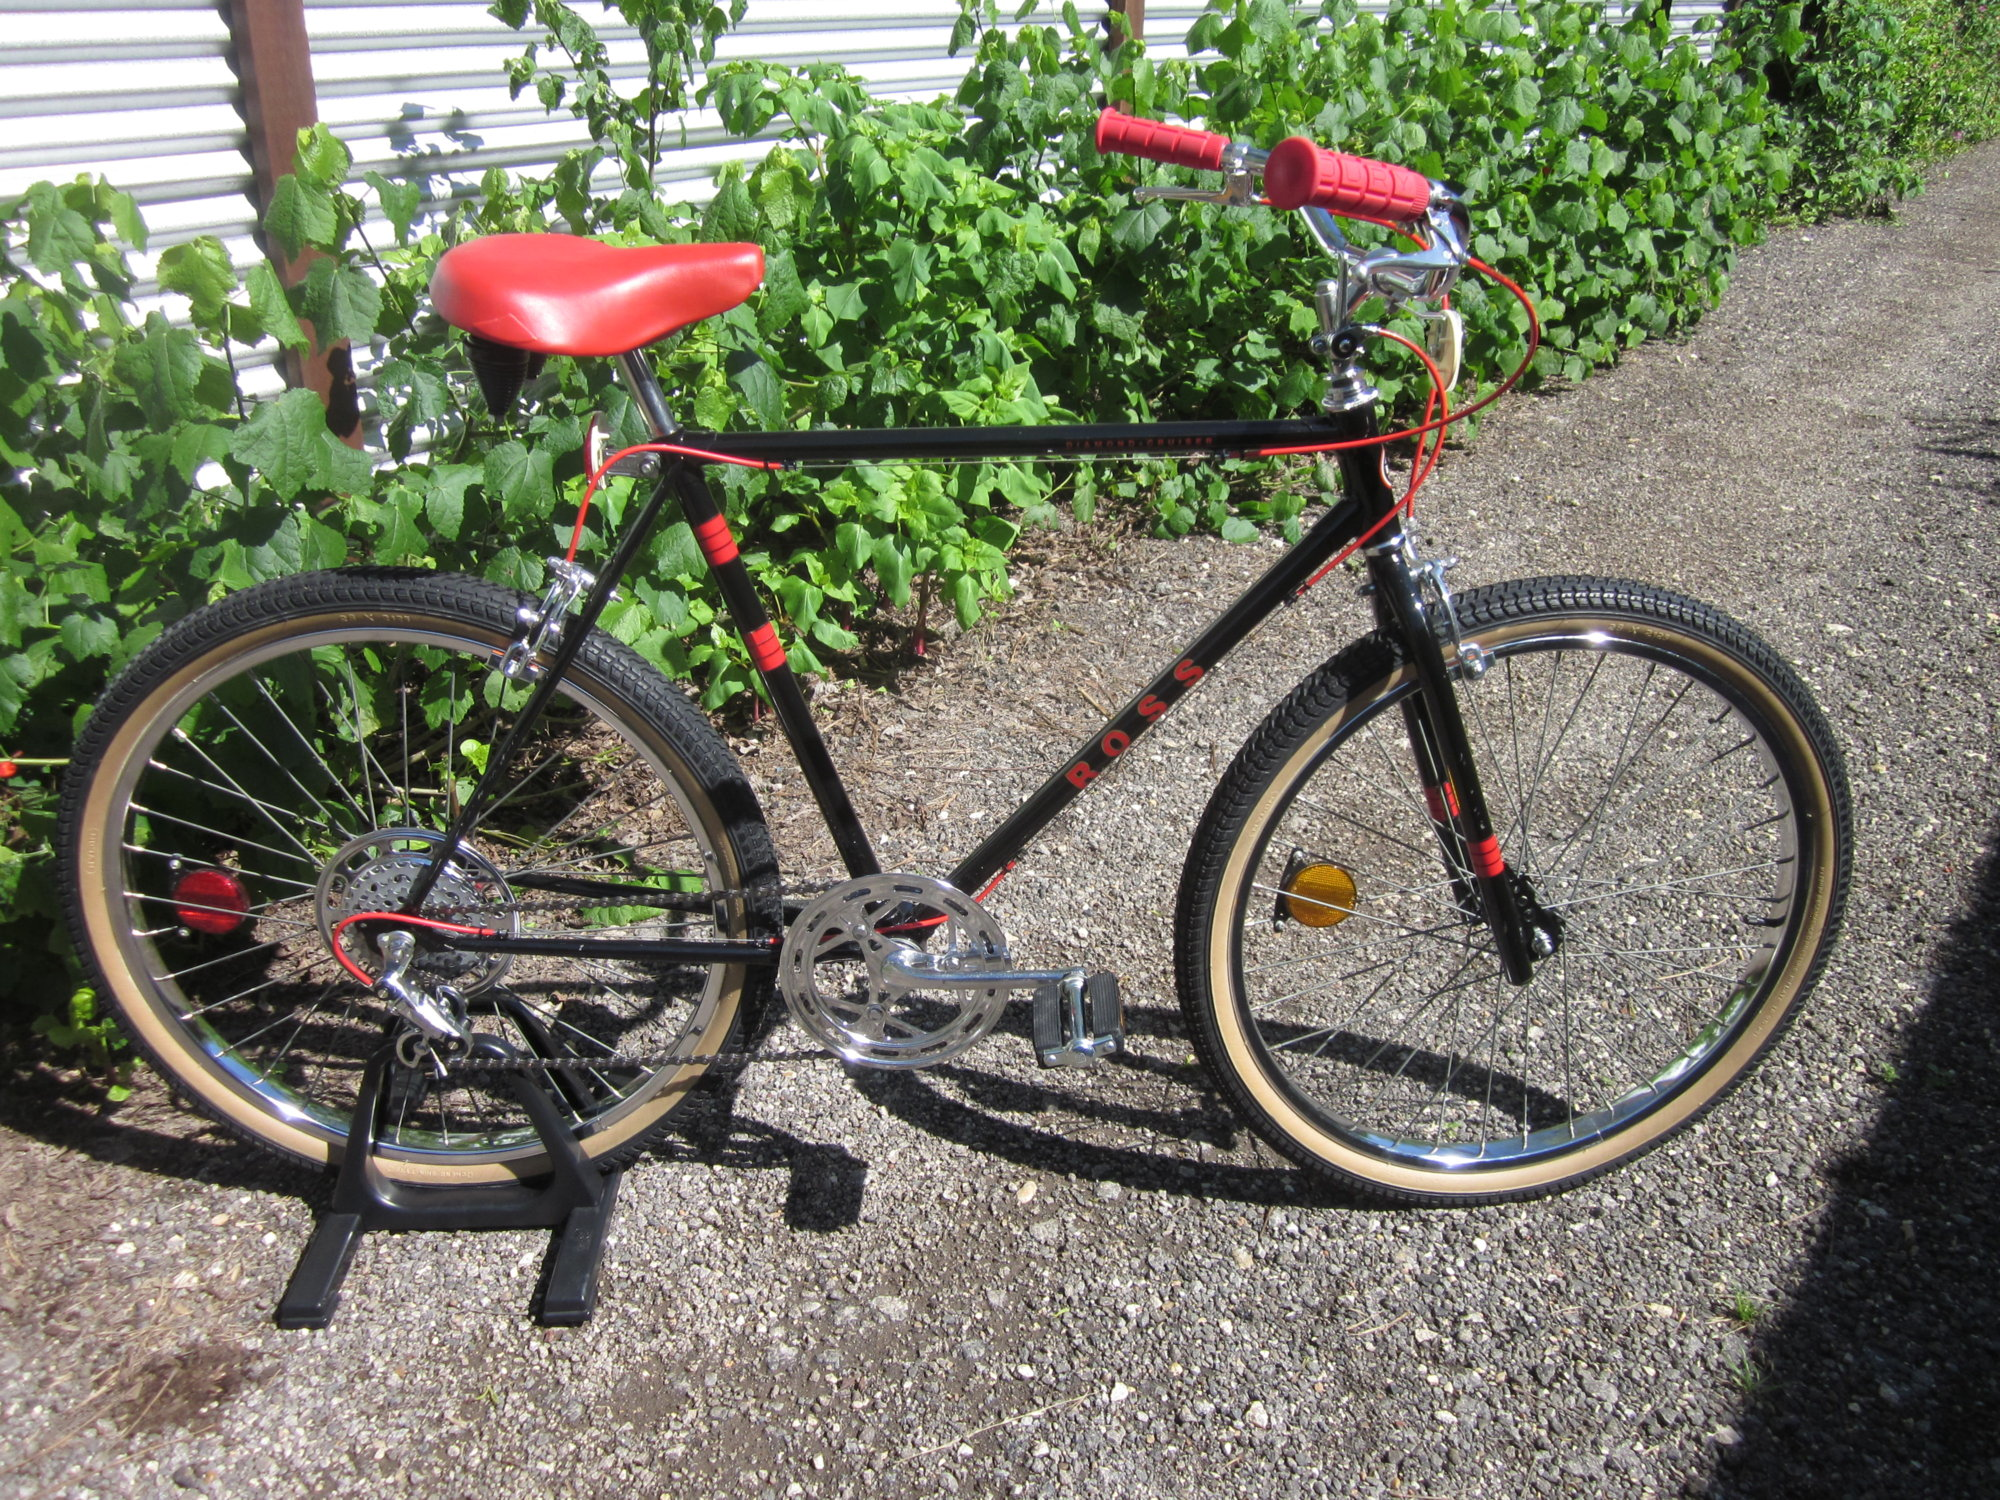 Ross Bike 002.JPG